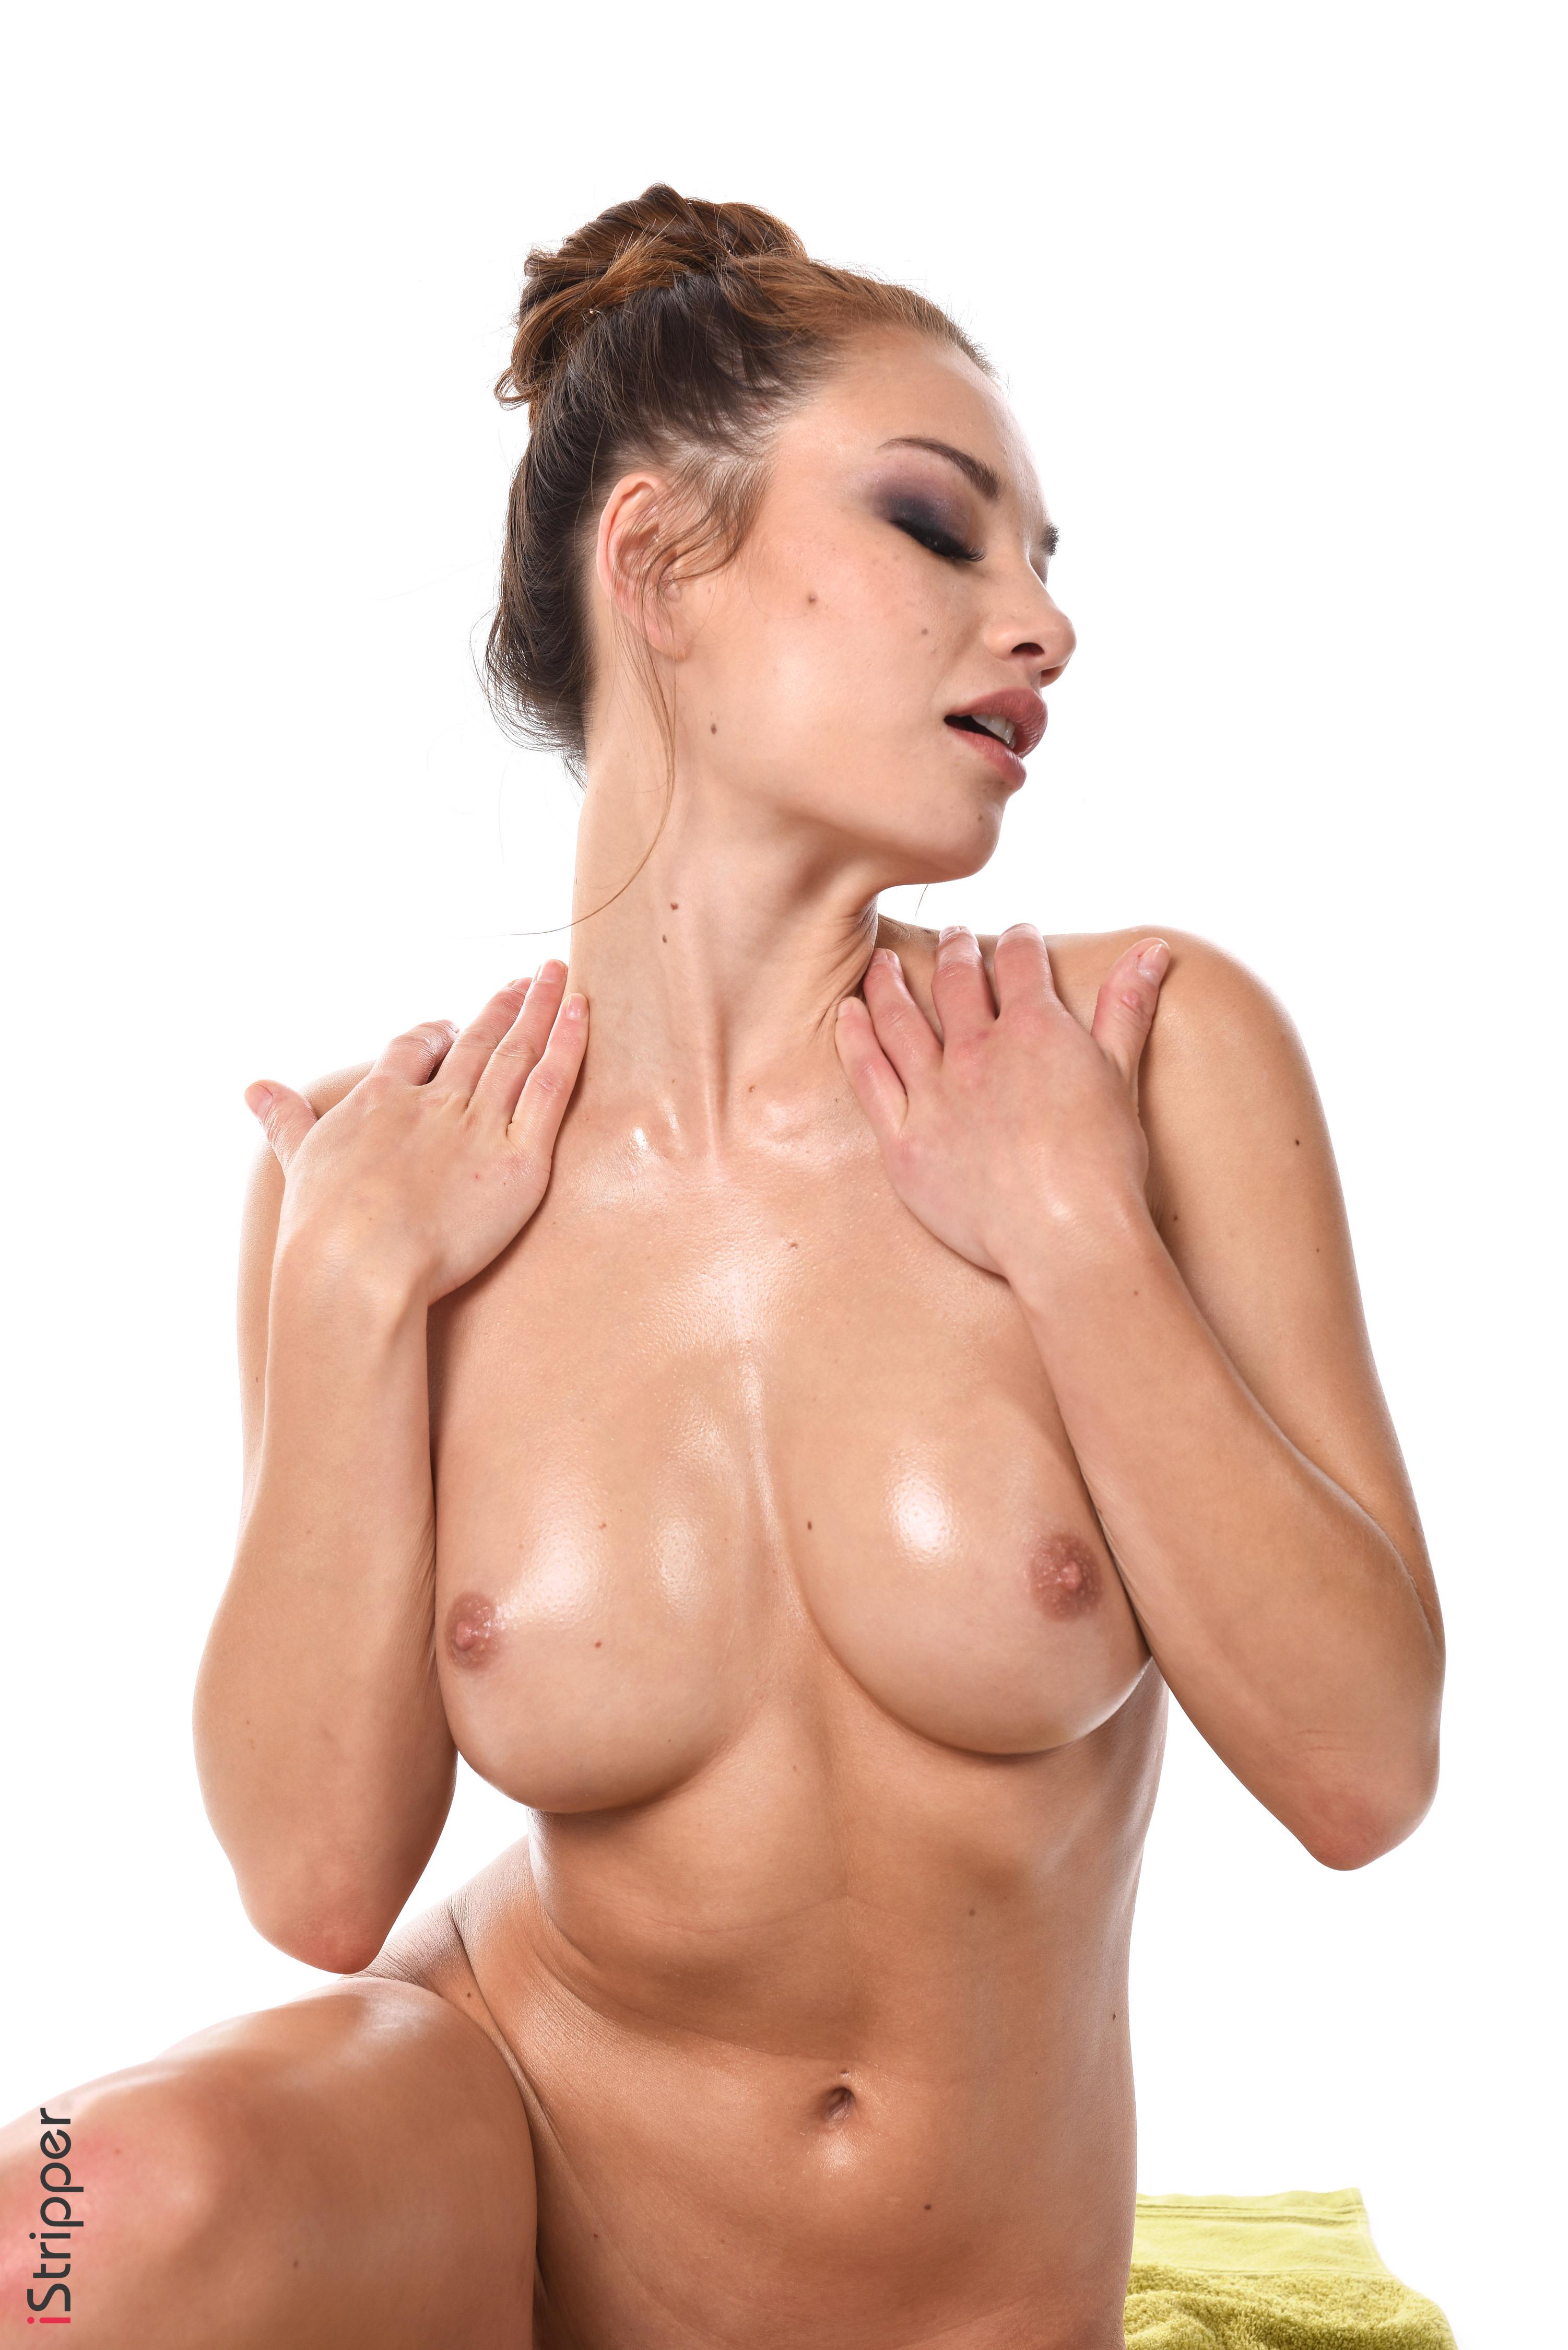 dailymotion sapphire boob